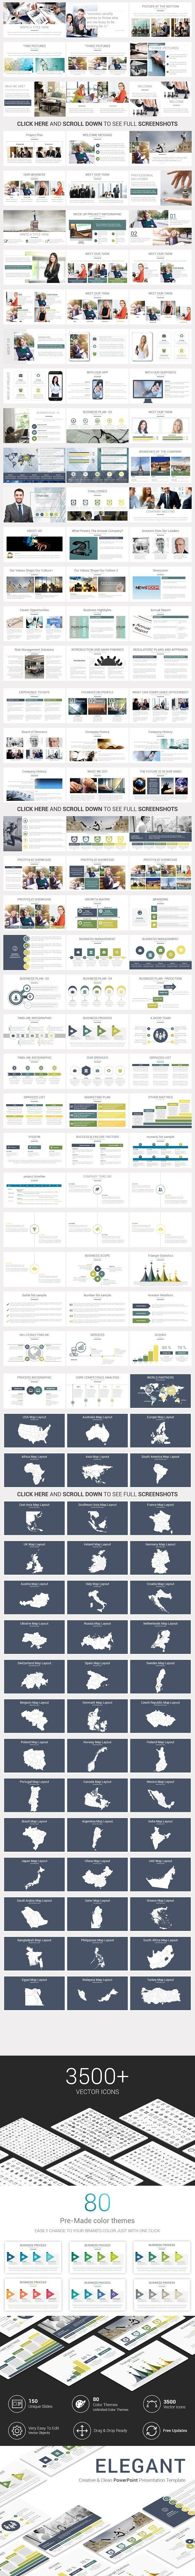 Elegant PowerPoint Template 228 best Google Slides